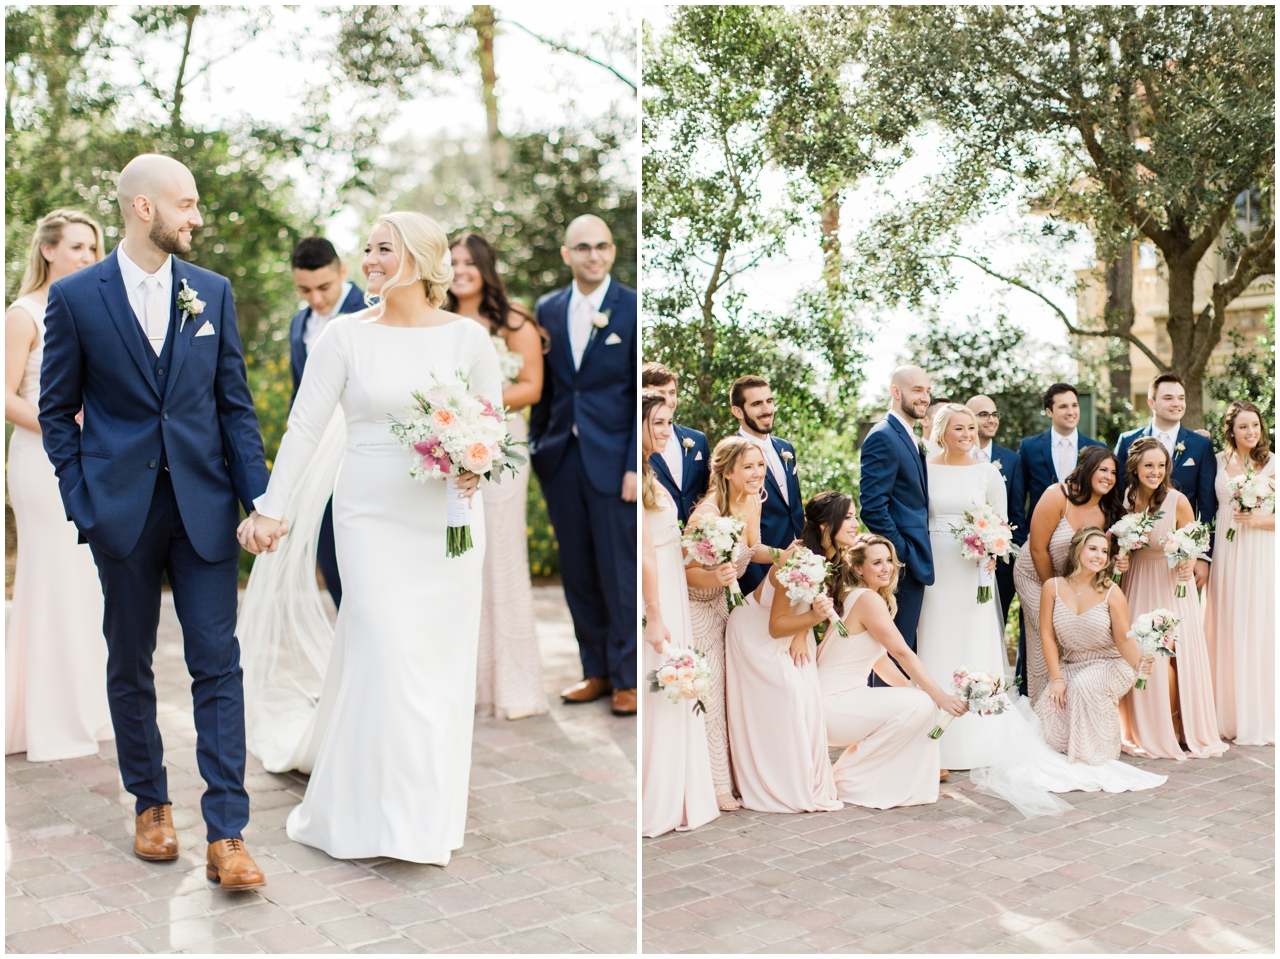 Jacksonville-Wedding-photographers-brooke-images-TPC-Sawgrass-Wedding-Mary-Kevin-blog_0017.jpg